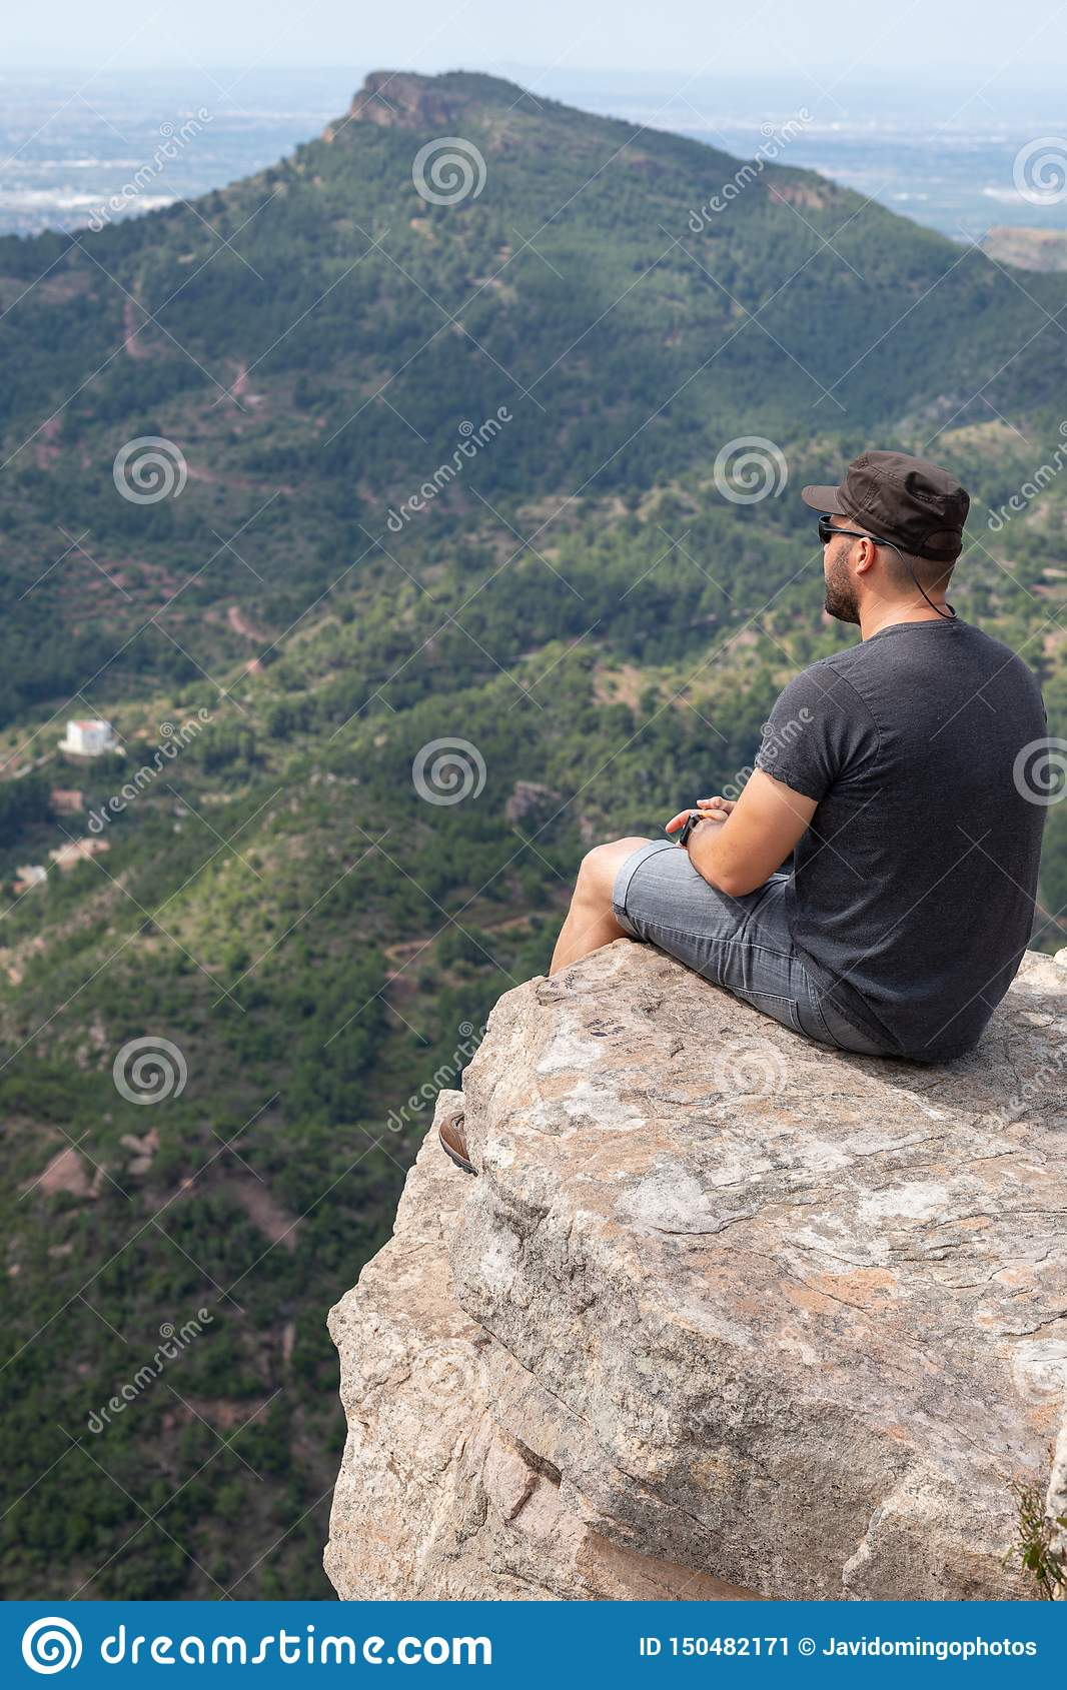 Panoramic View Of Tourist On Mountain Peak